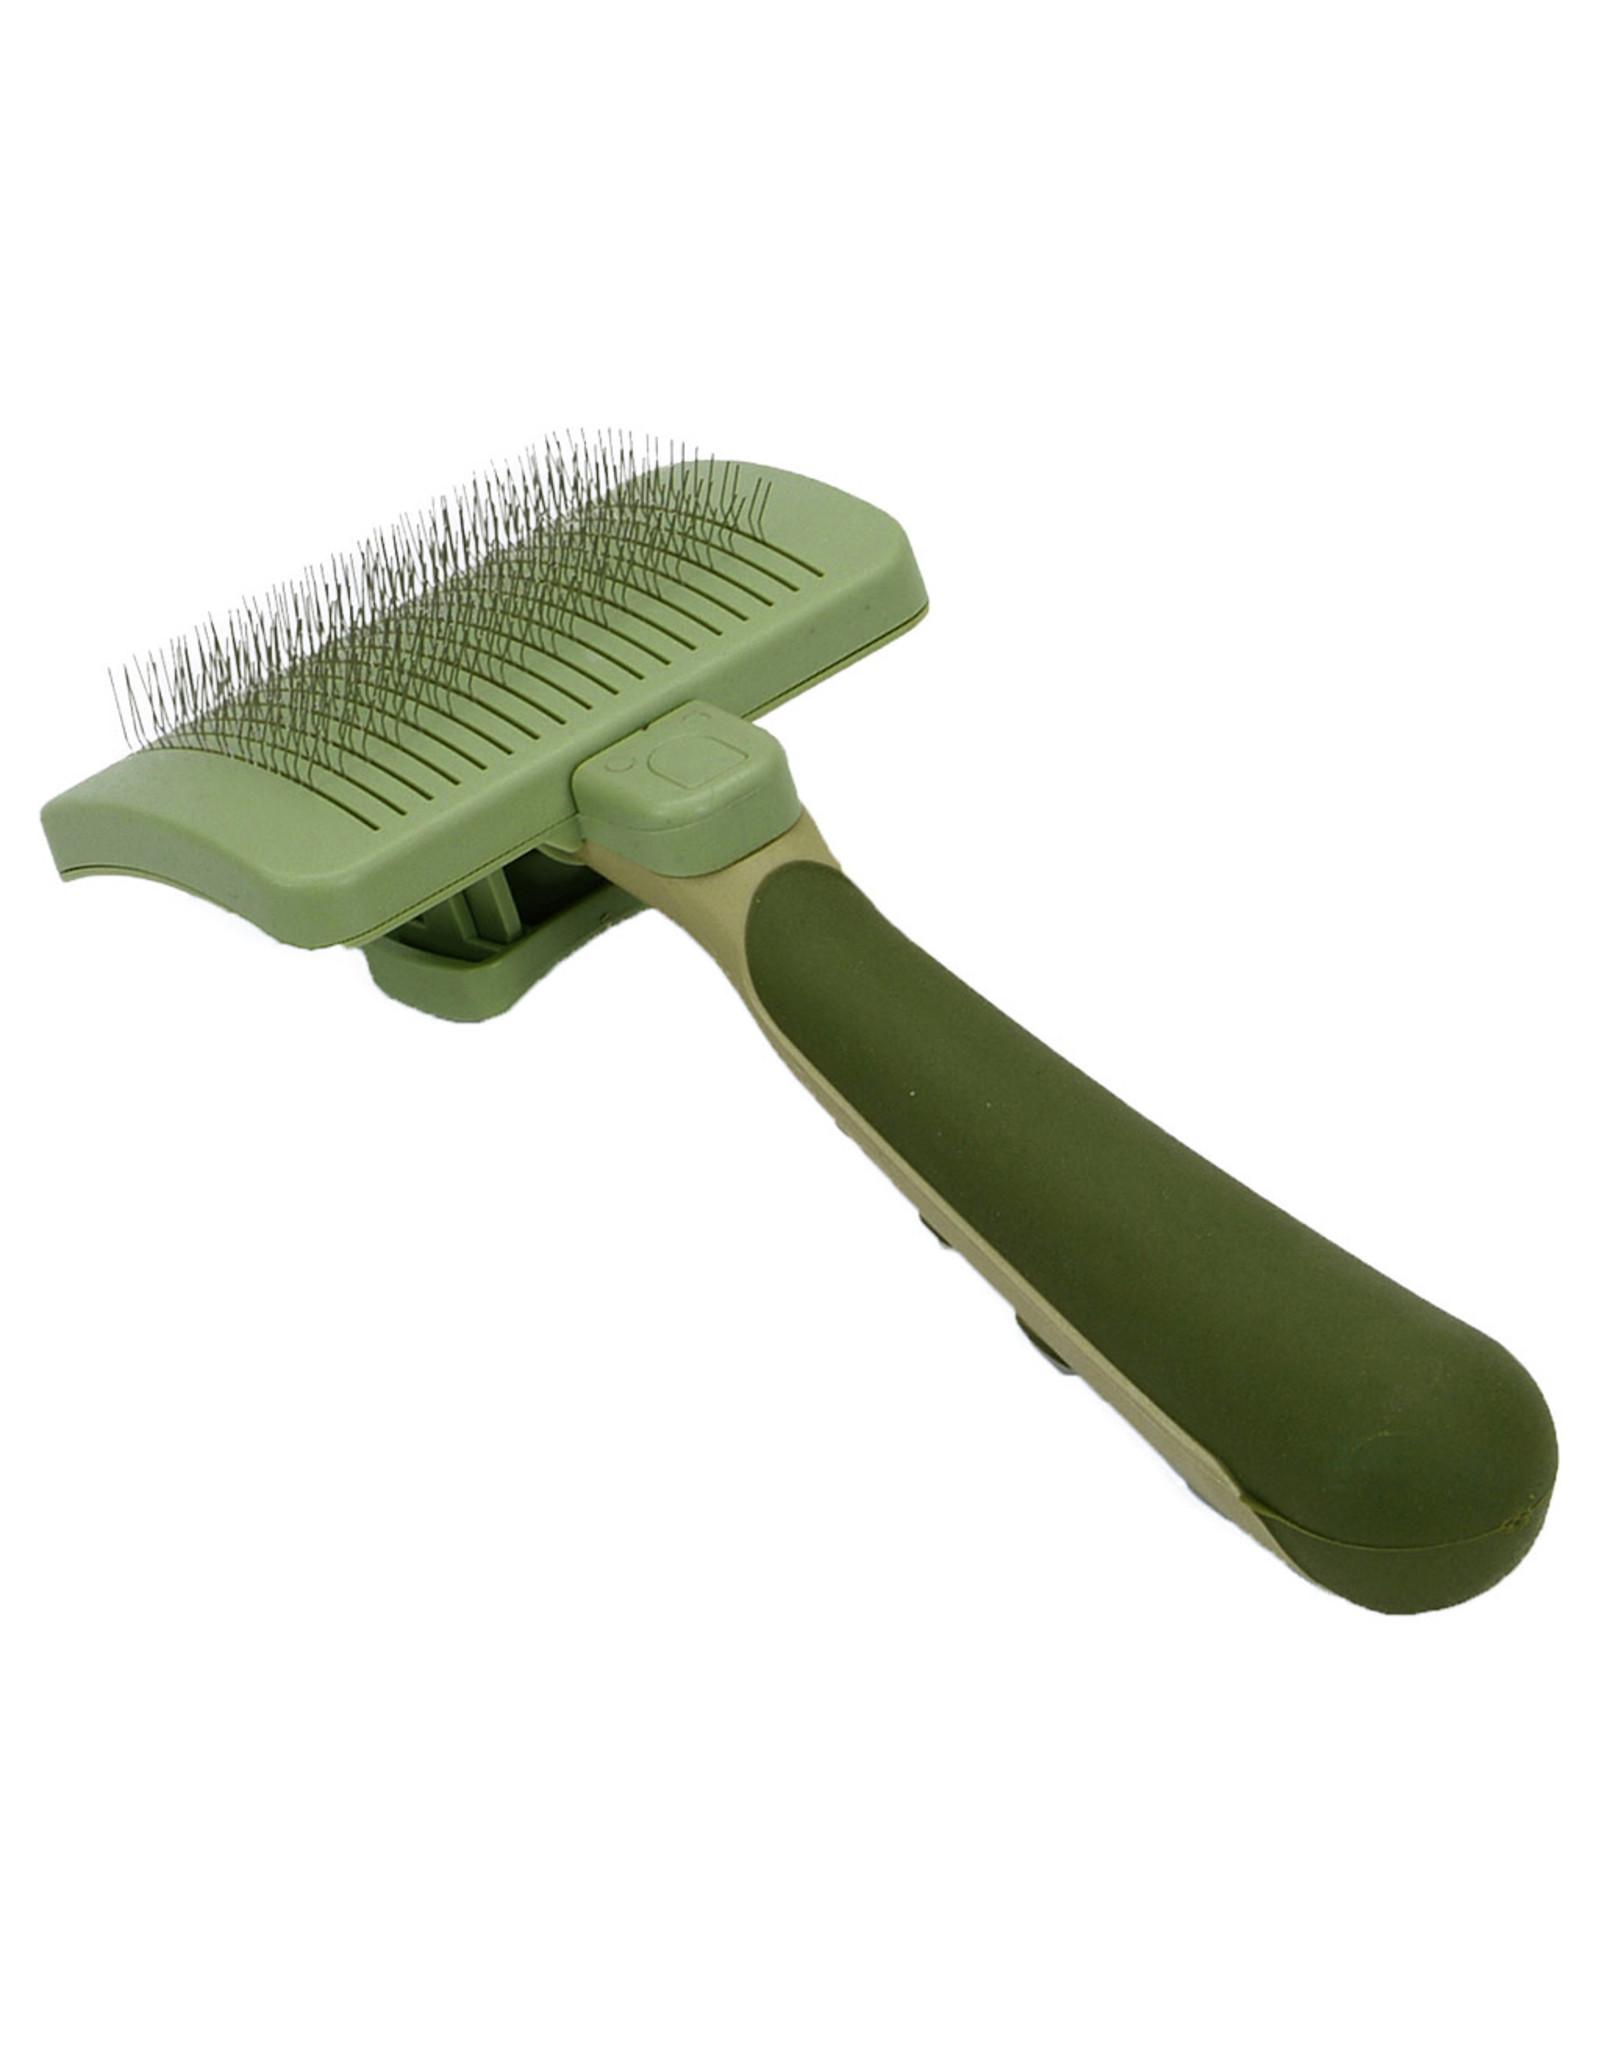 Coastal Pet Products Safari Self Cleaning Slicker Brush [CAT]